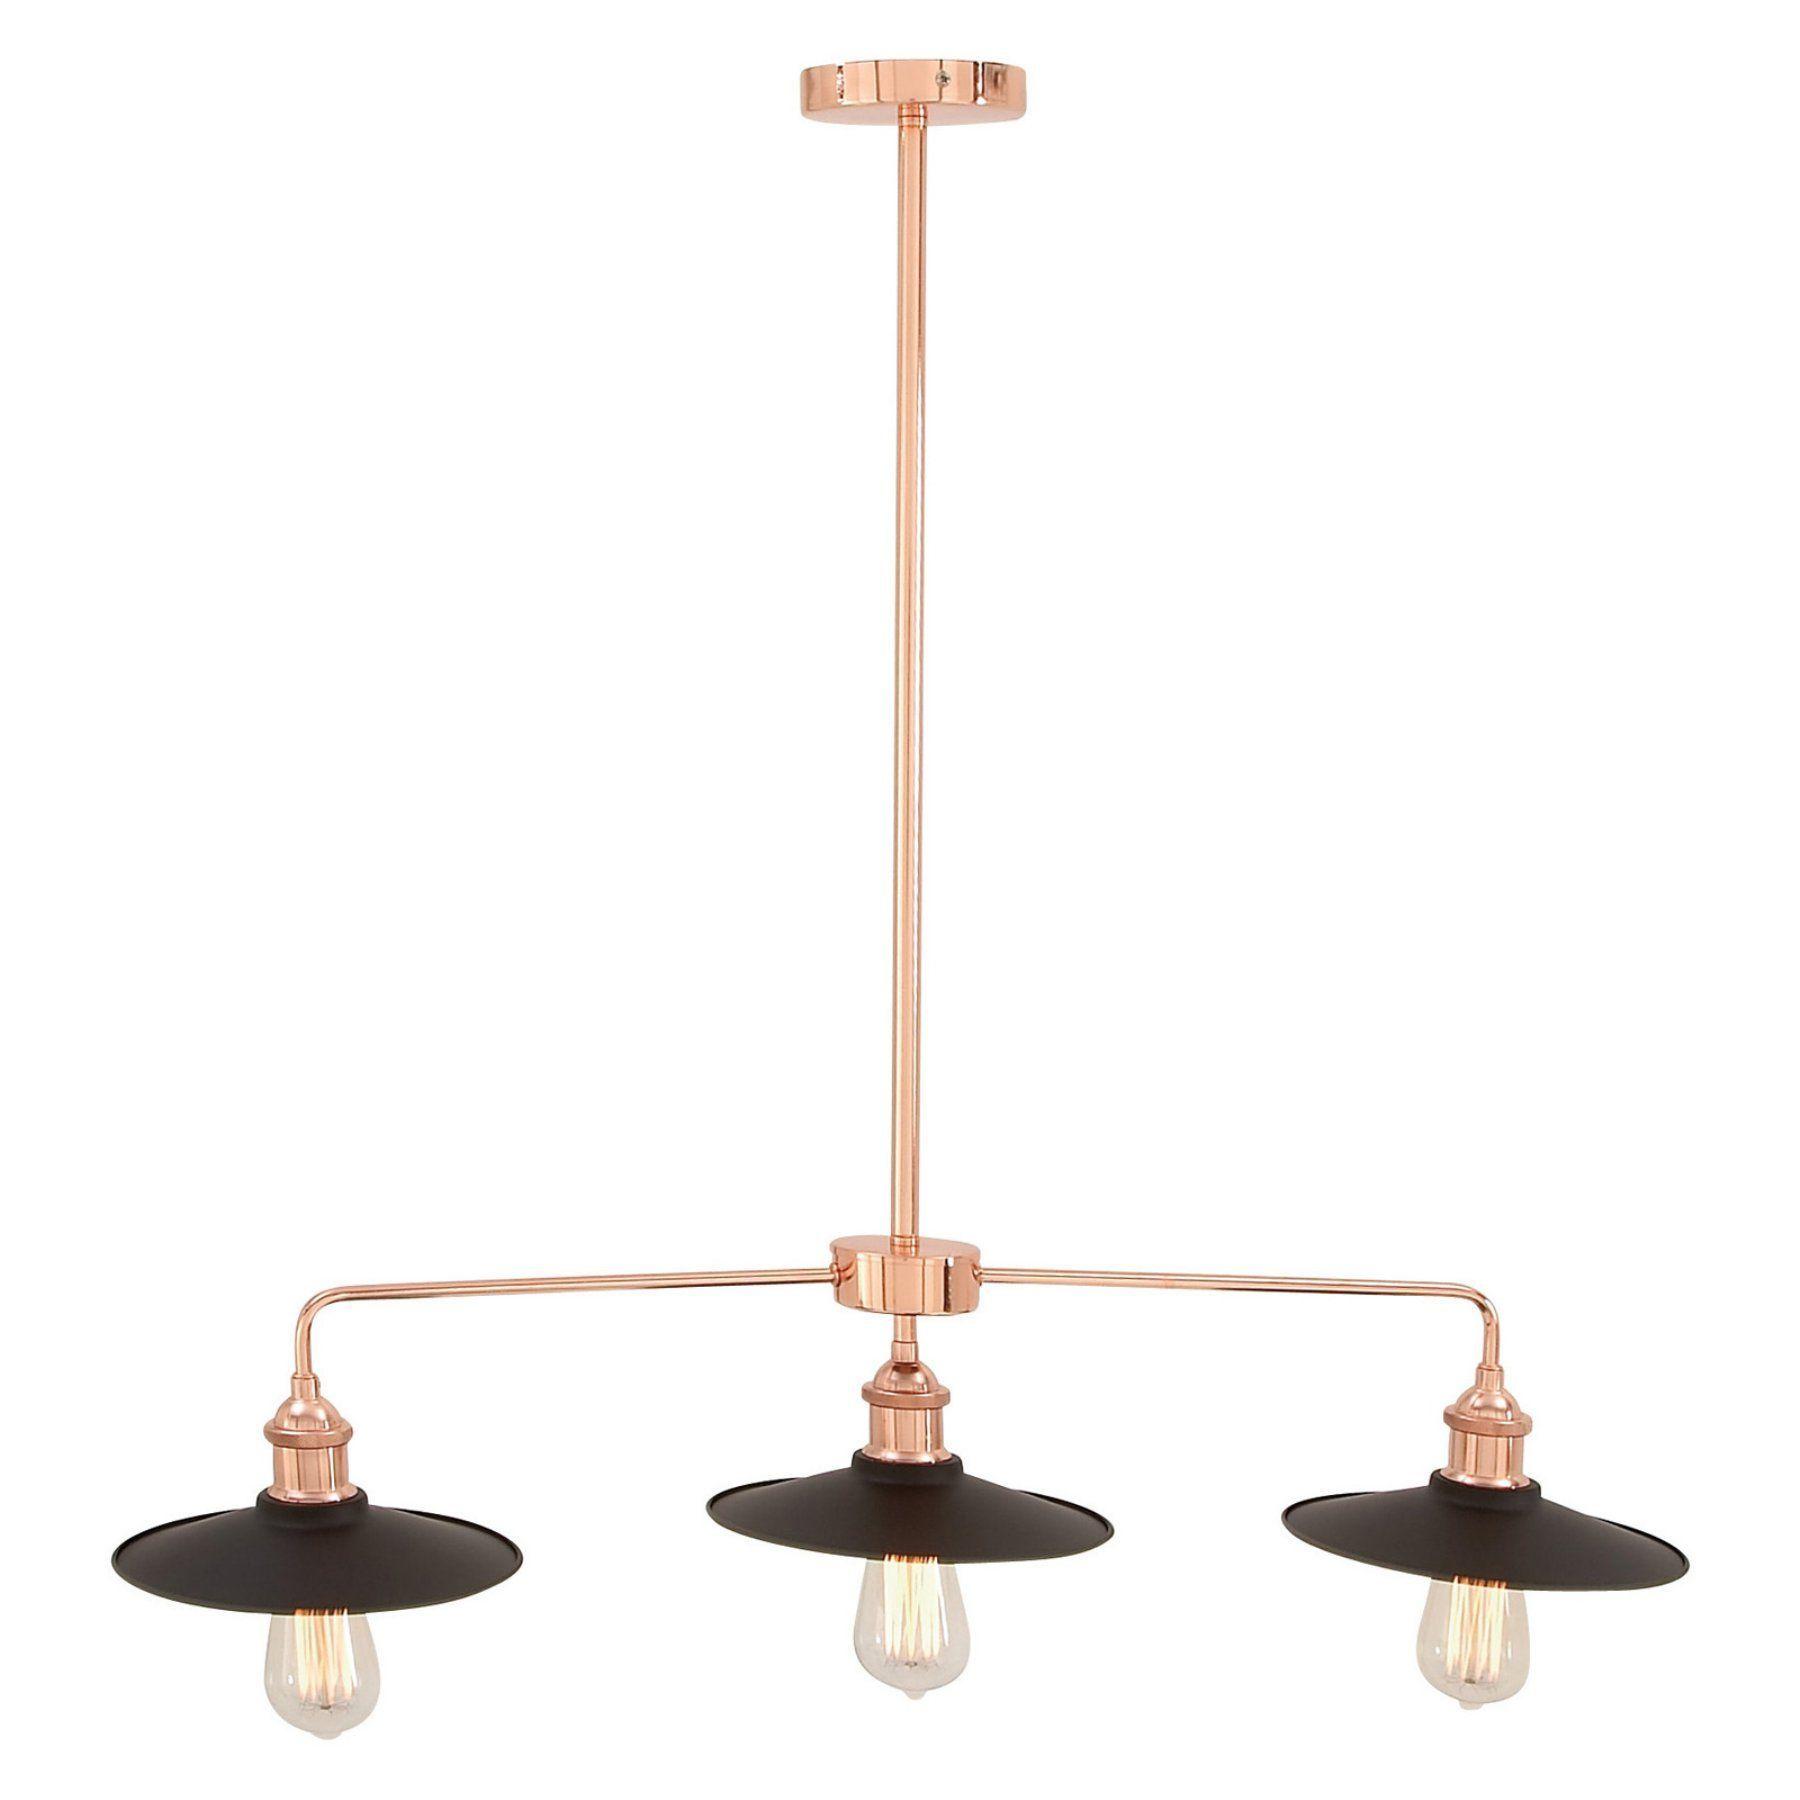 DecMode Industrial Pendant Light - 59274